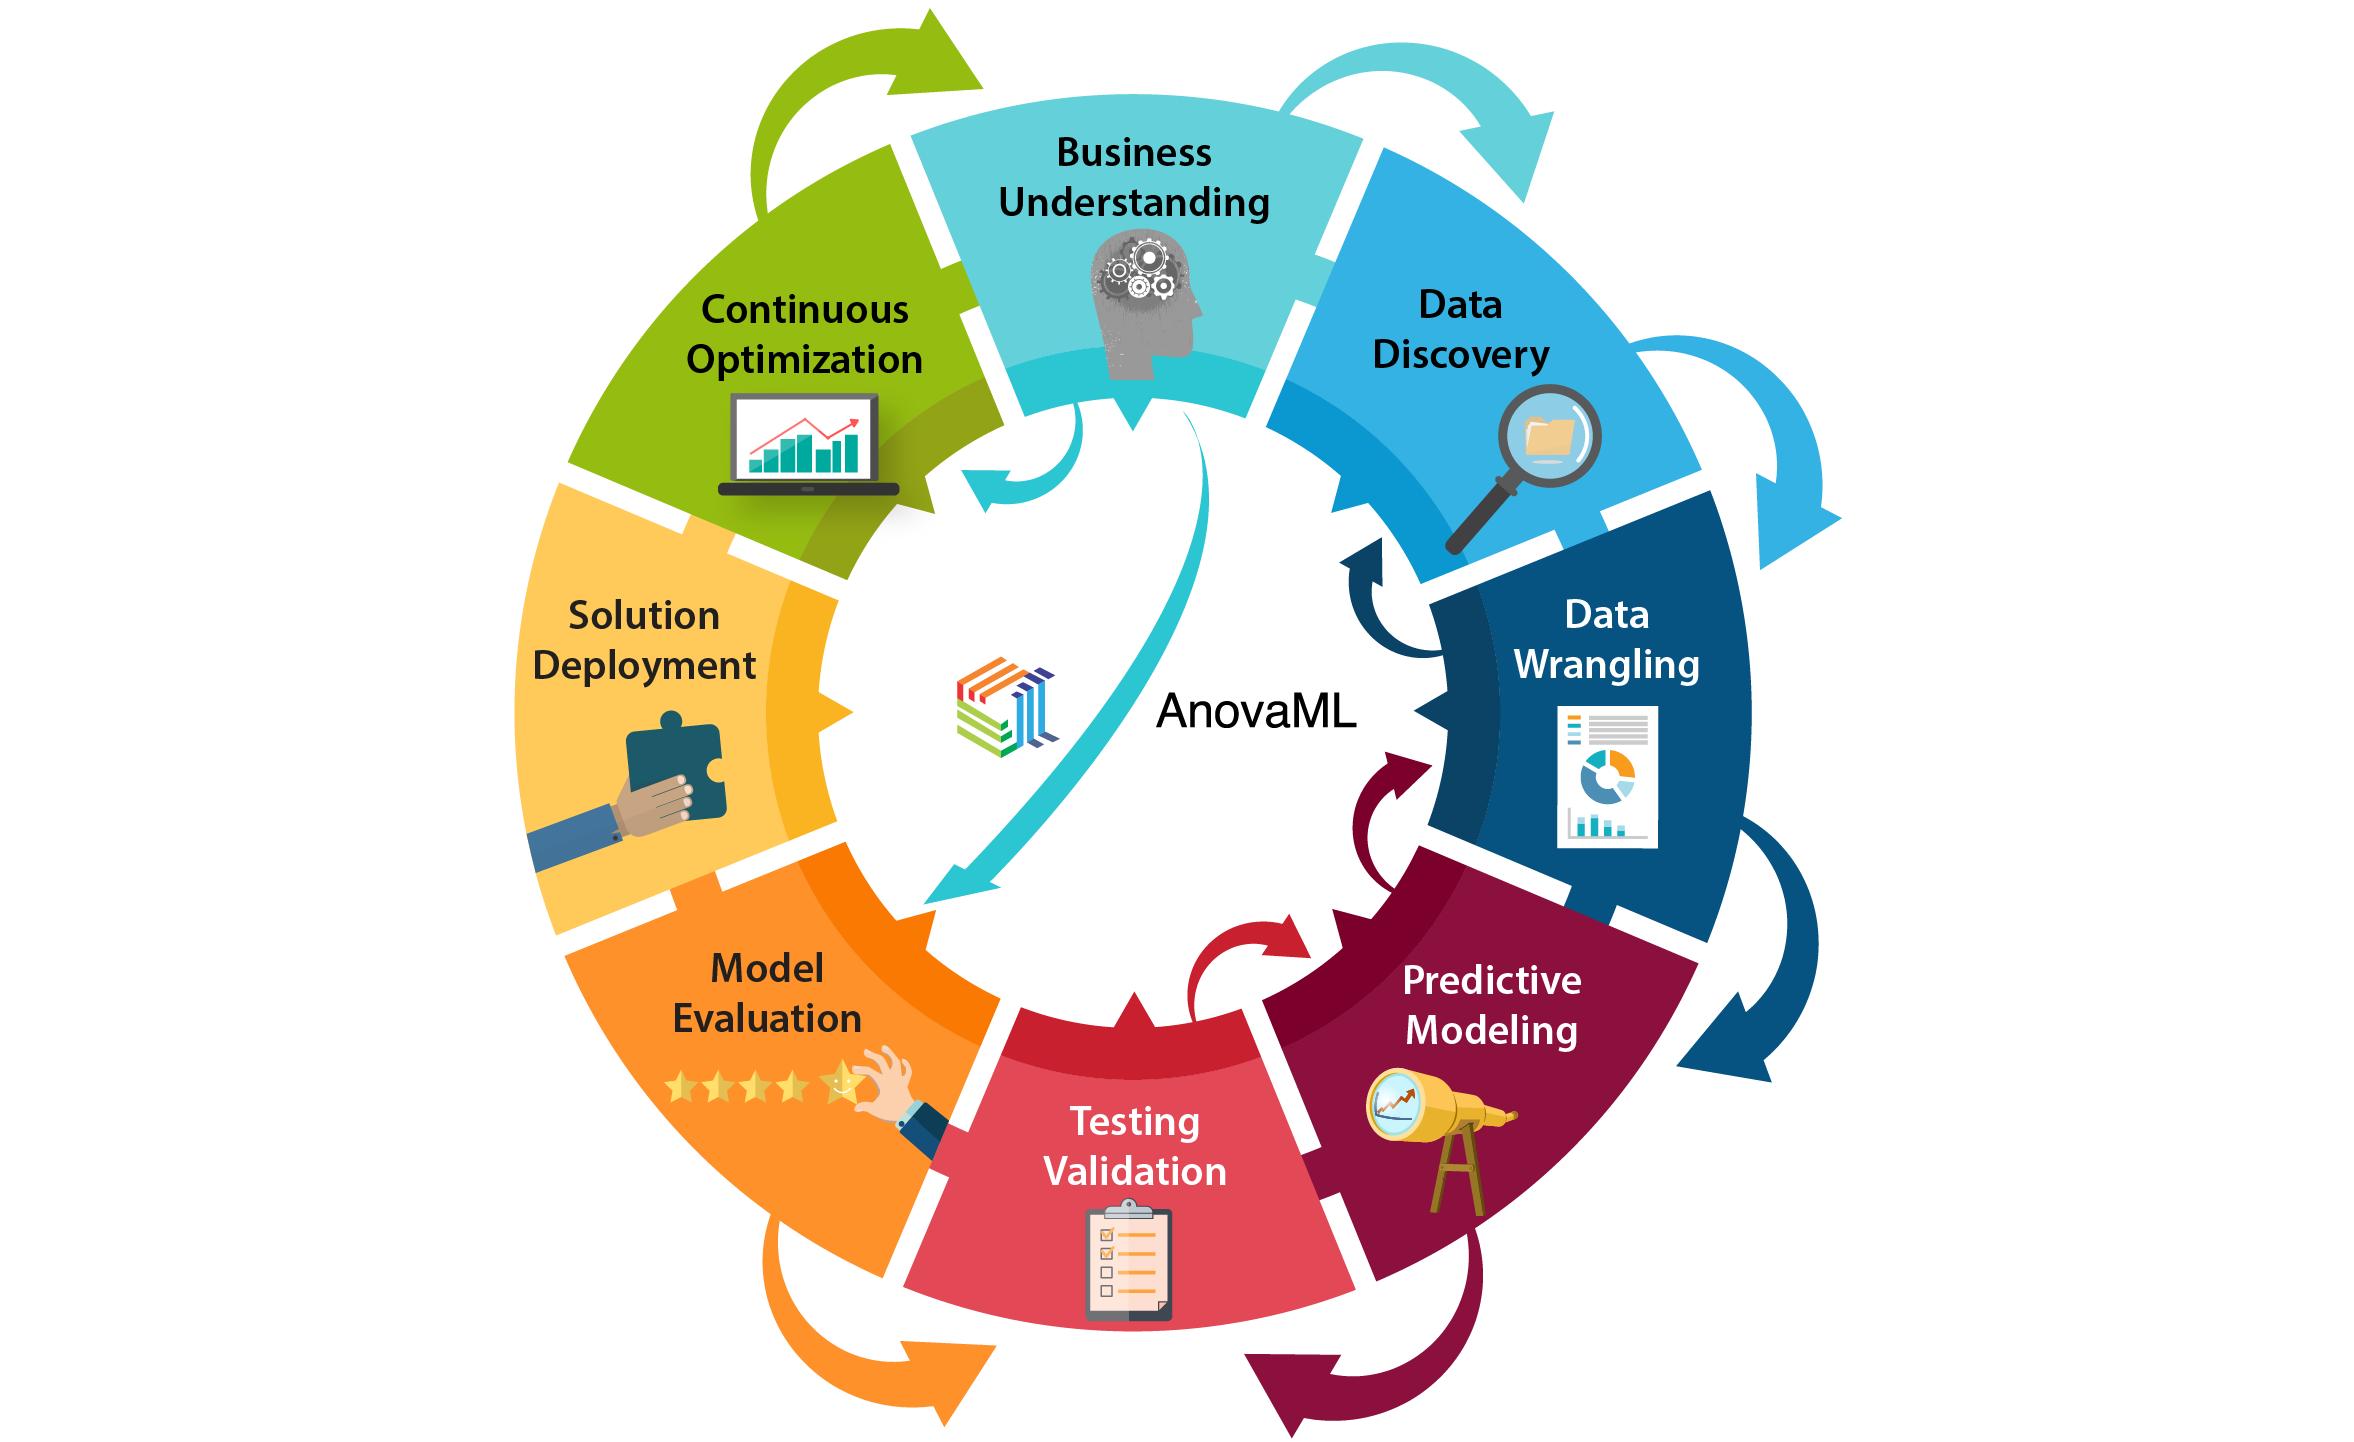 AnovaAnalytics-PredictiveModelingProcess2